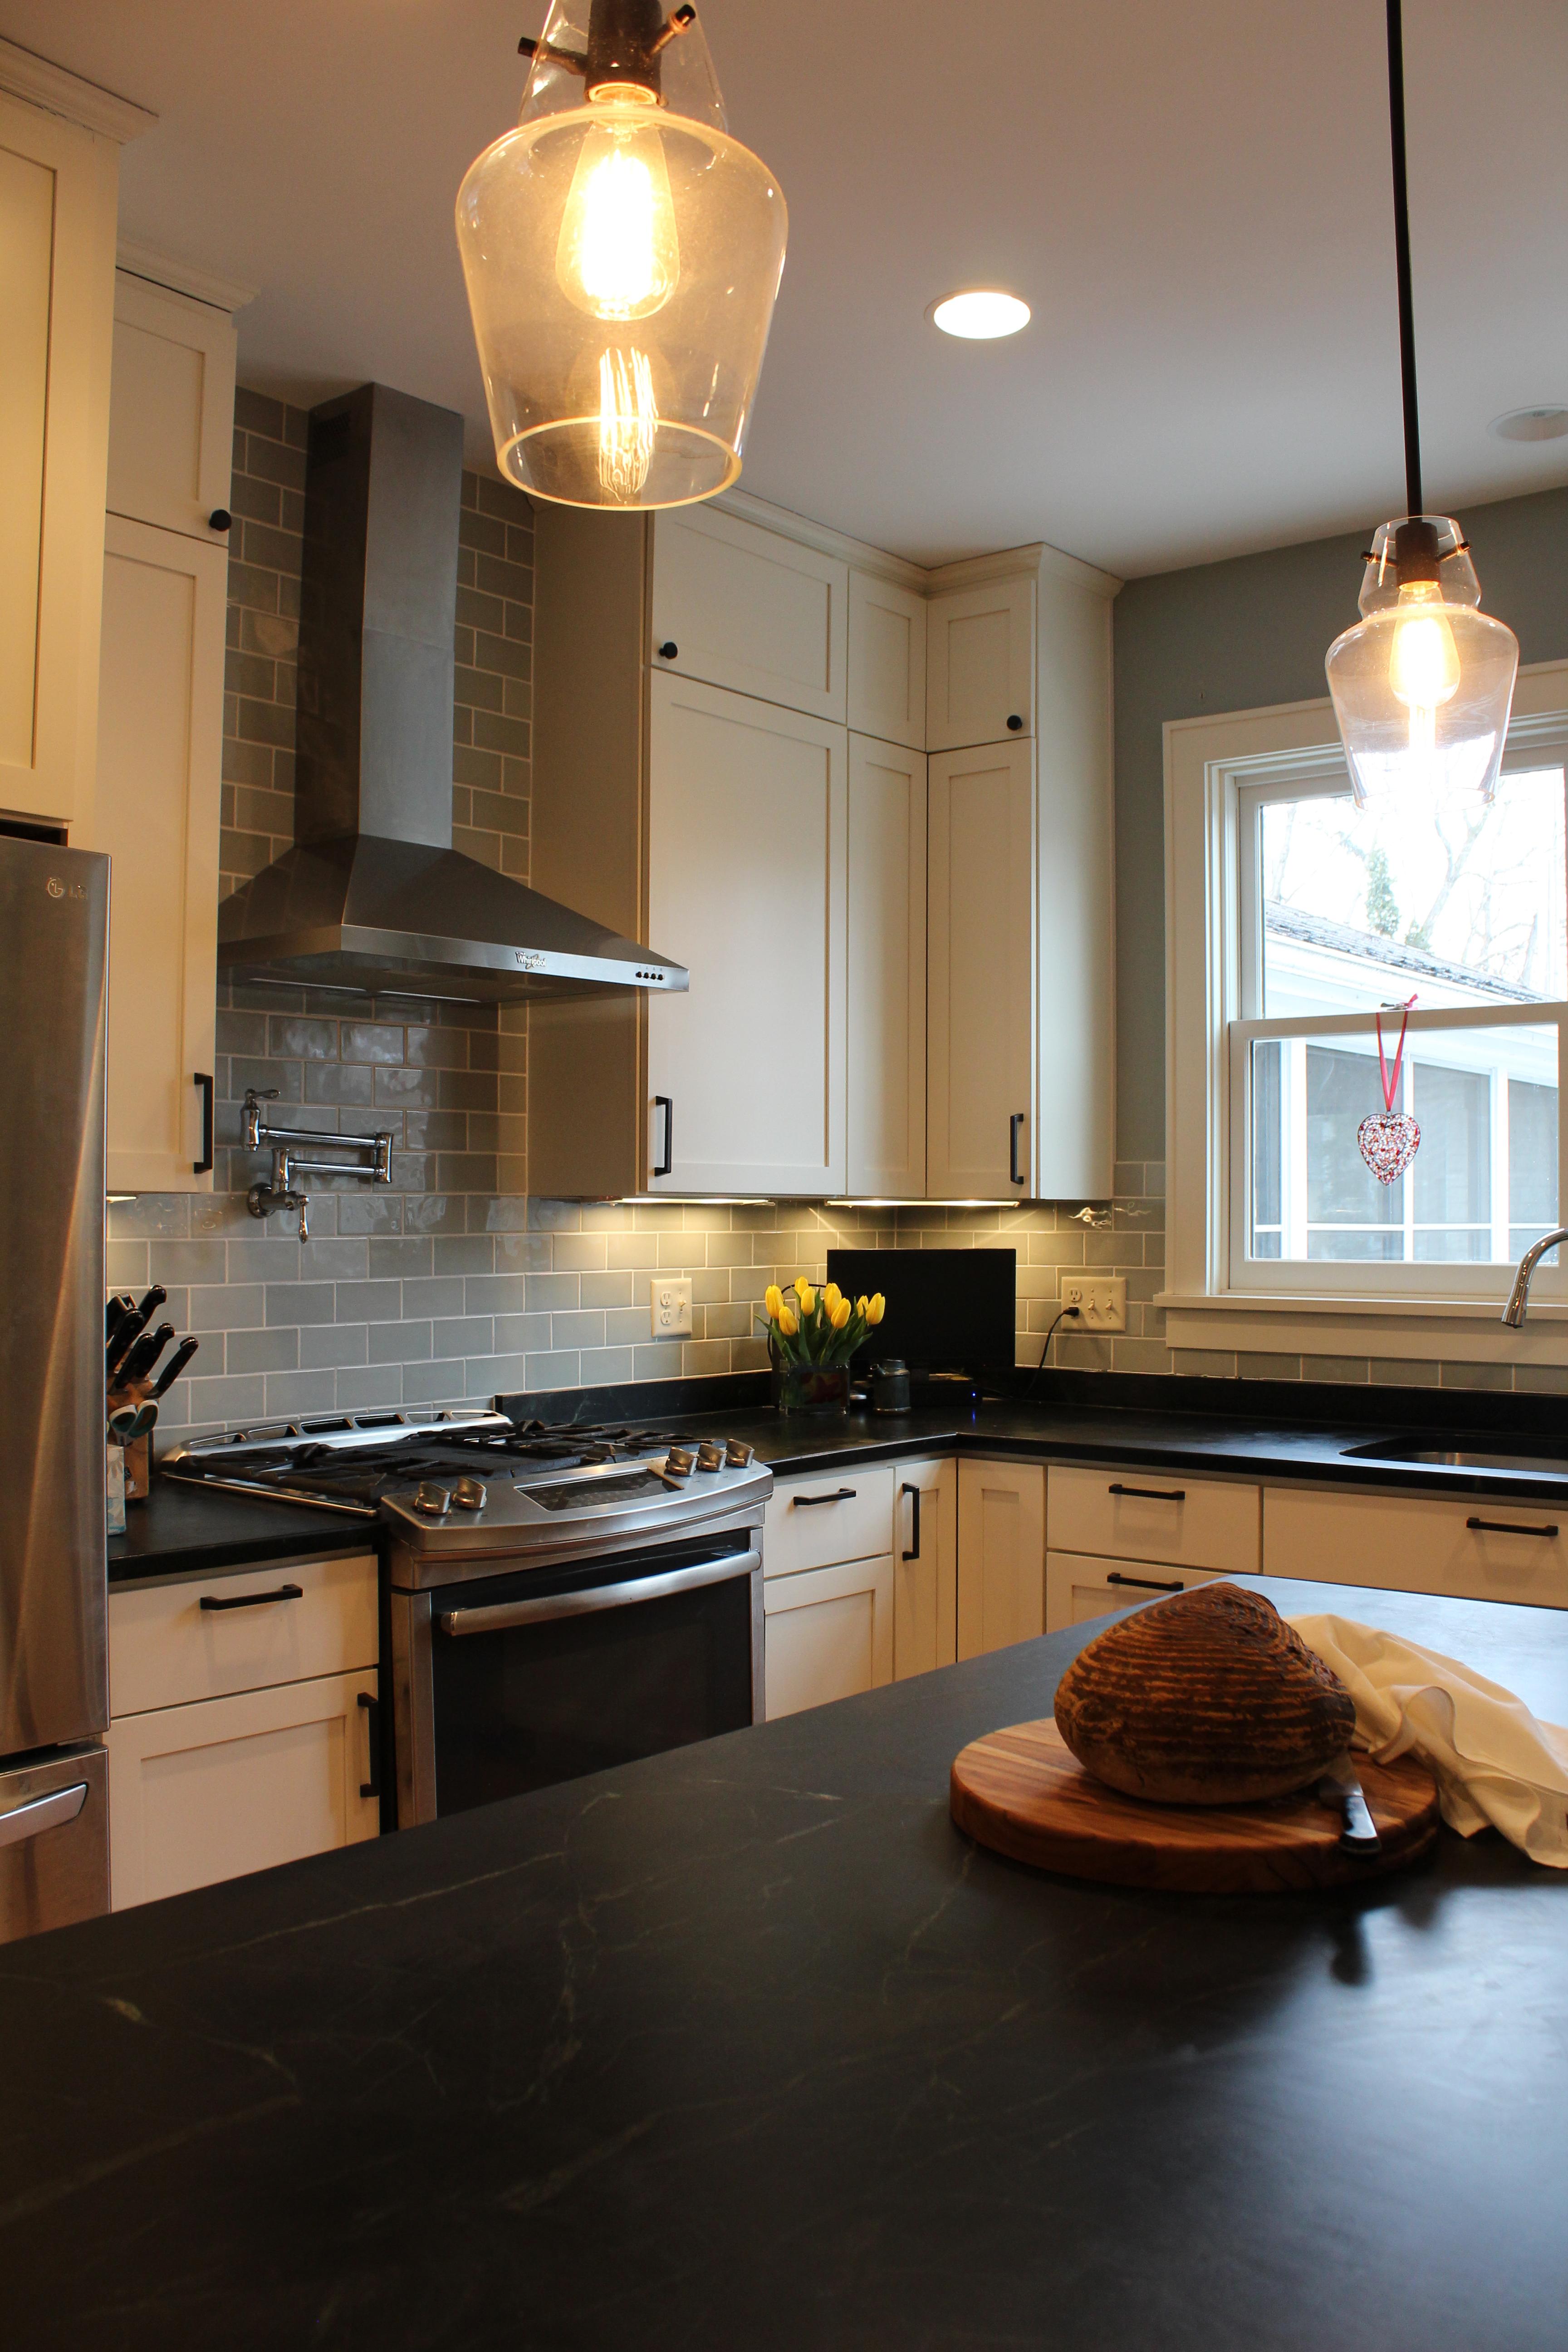 Kitchen Architecture Design Vivus Architecture Design A Archive A Old House New Kitchen